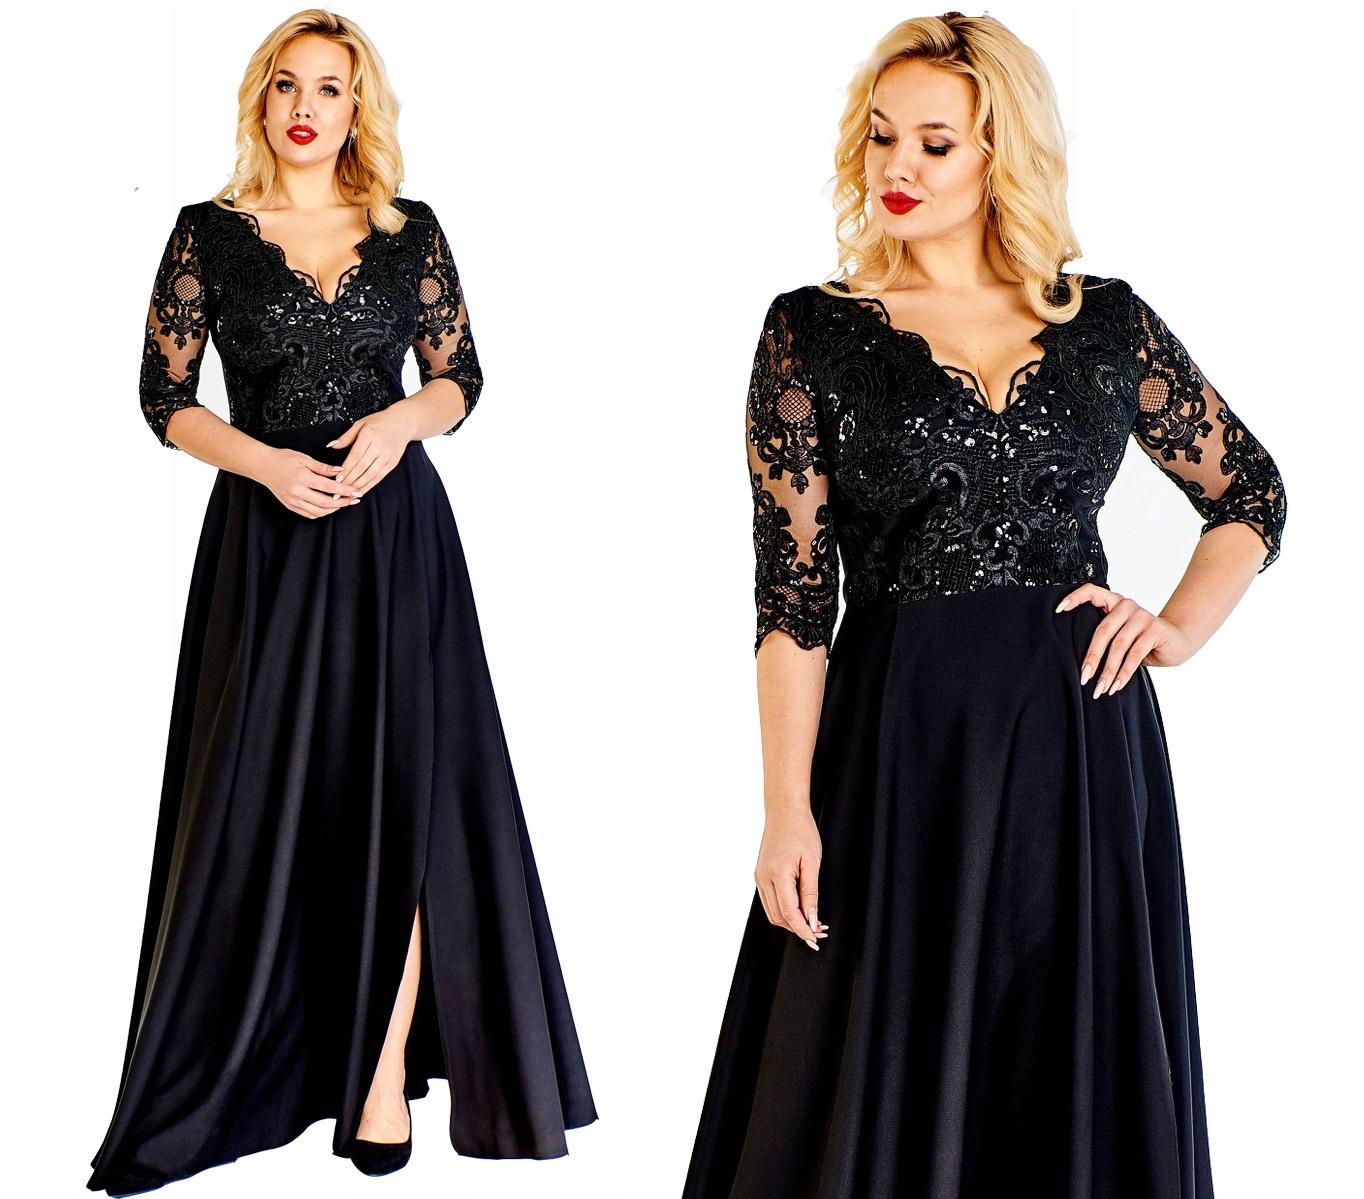 7d5141ec42 Sukienka elegancka długa 48 studniówka sylwester - 7716264830 ...